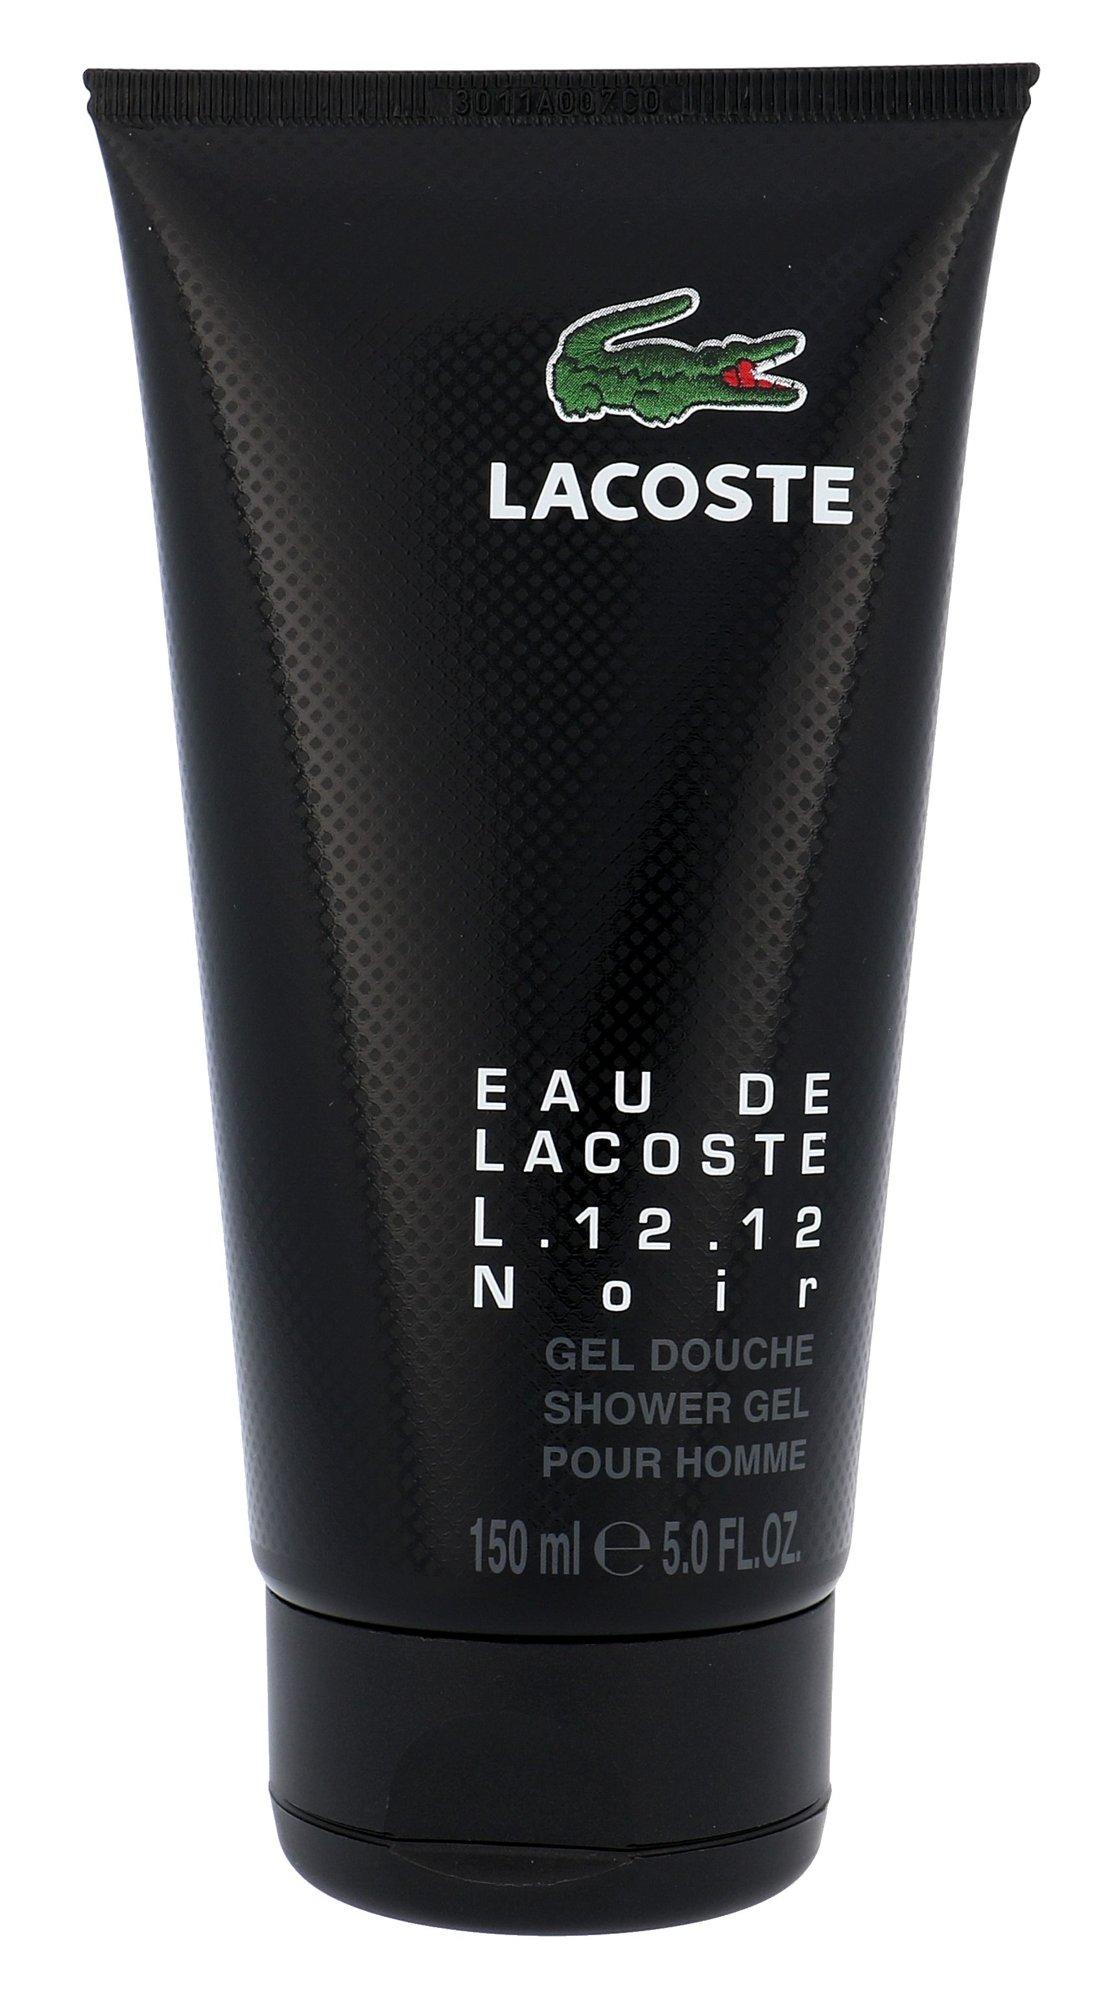 Lacoste Eau De Lacoste L.12.12 Noir Shower gel 150ml